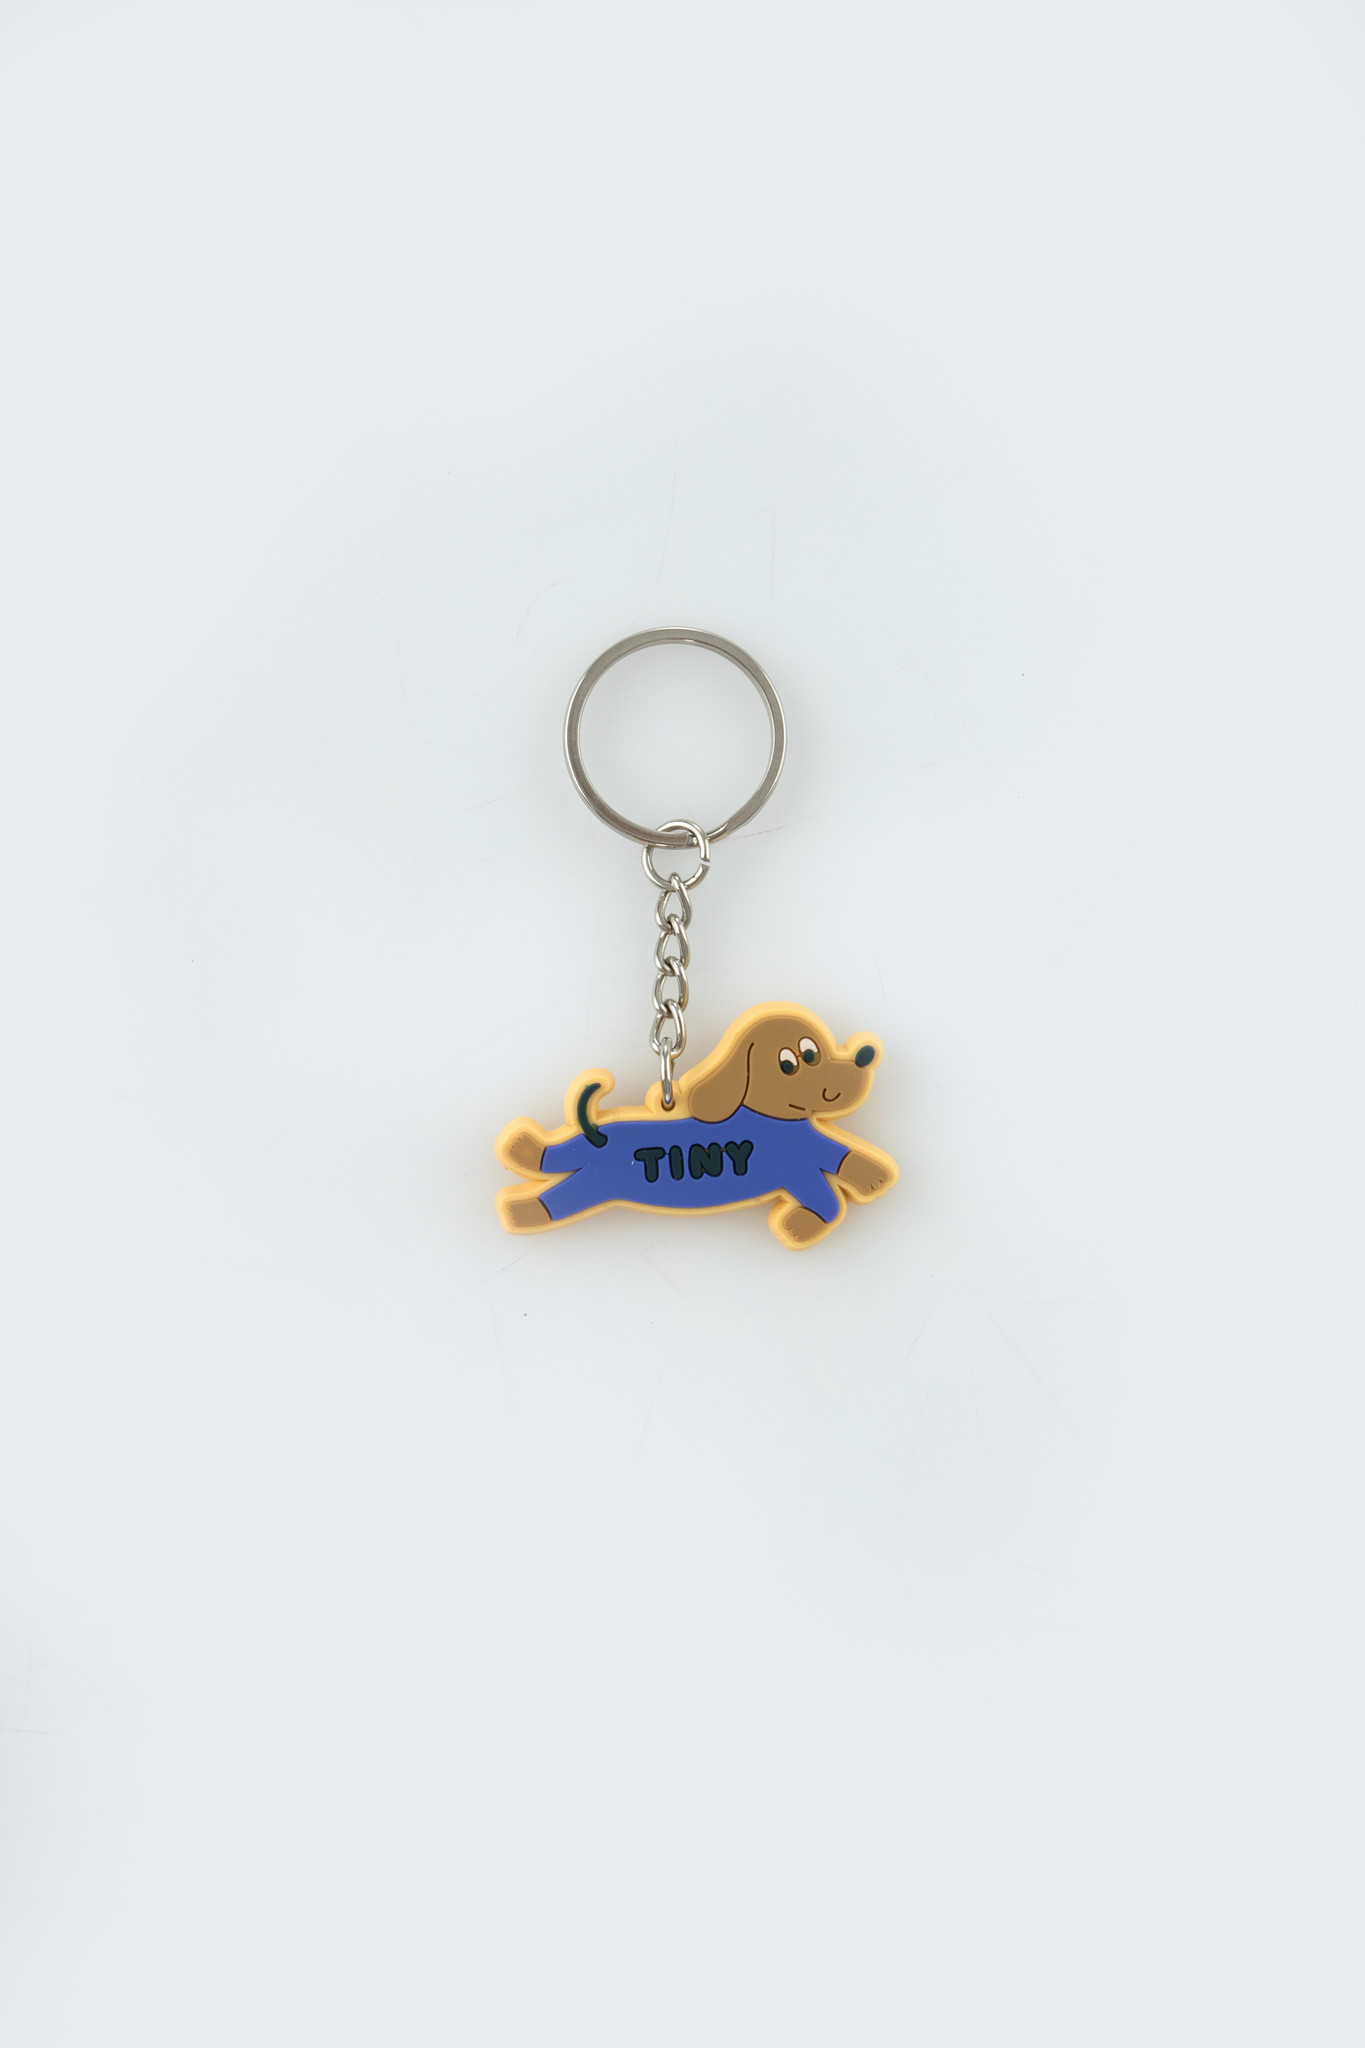 Doggy paddle key chain - Iris Blue-1